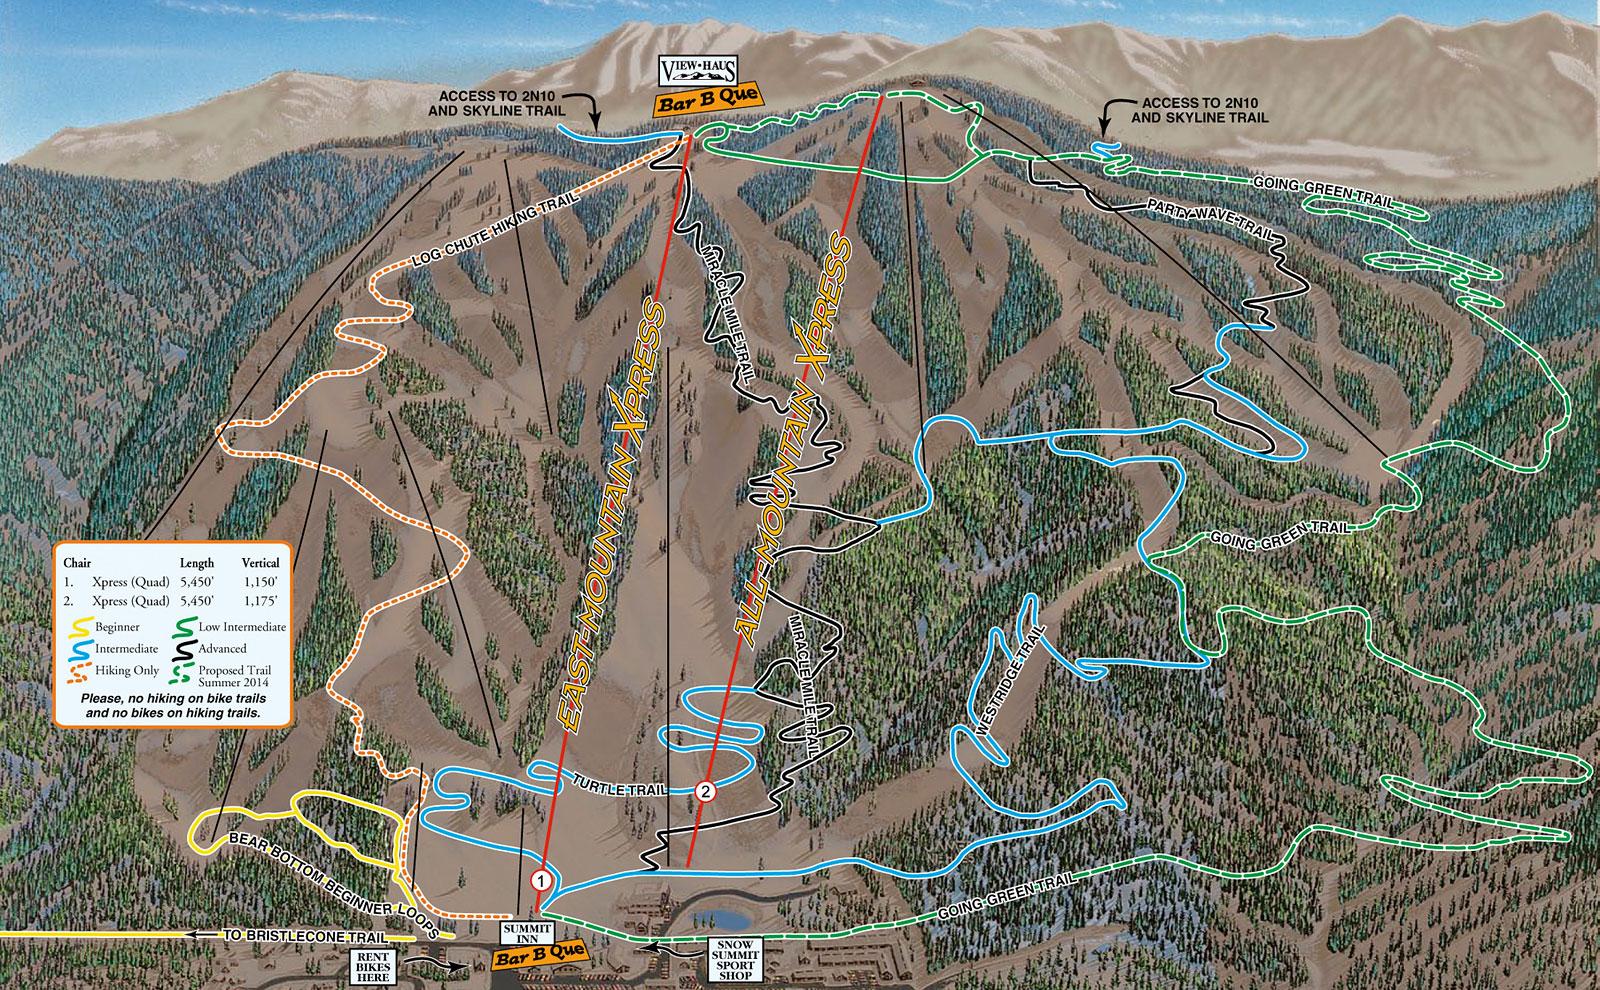 2014 Big Bear Summer Mountain Bike Riding Index